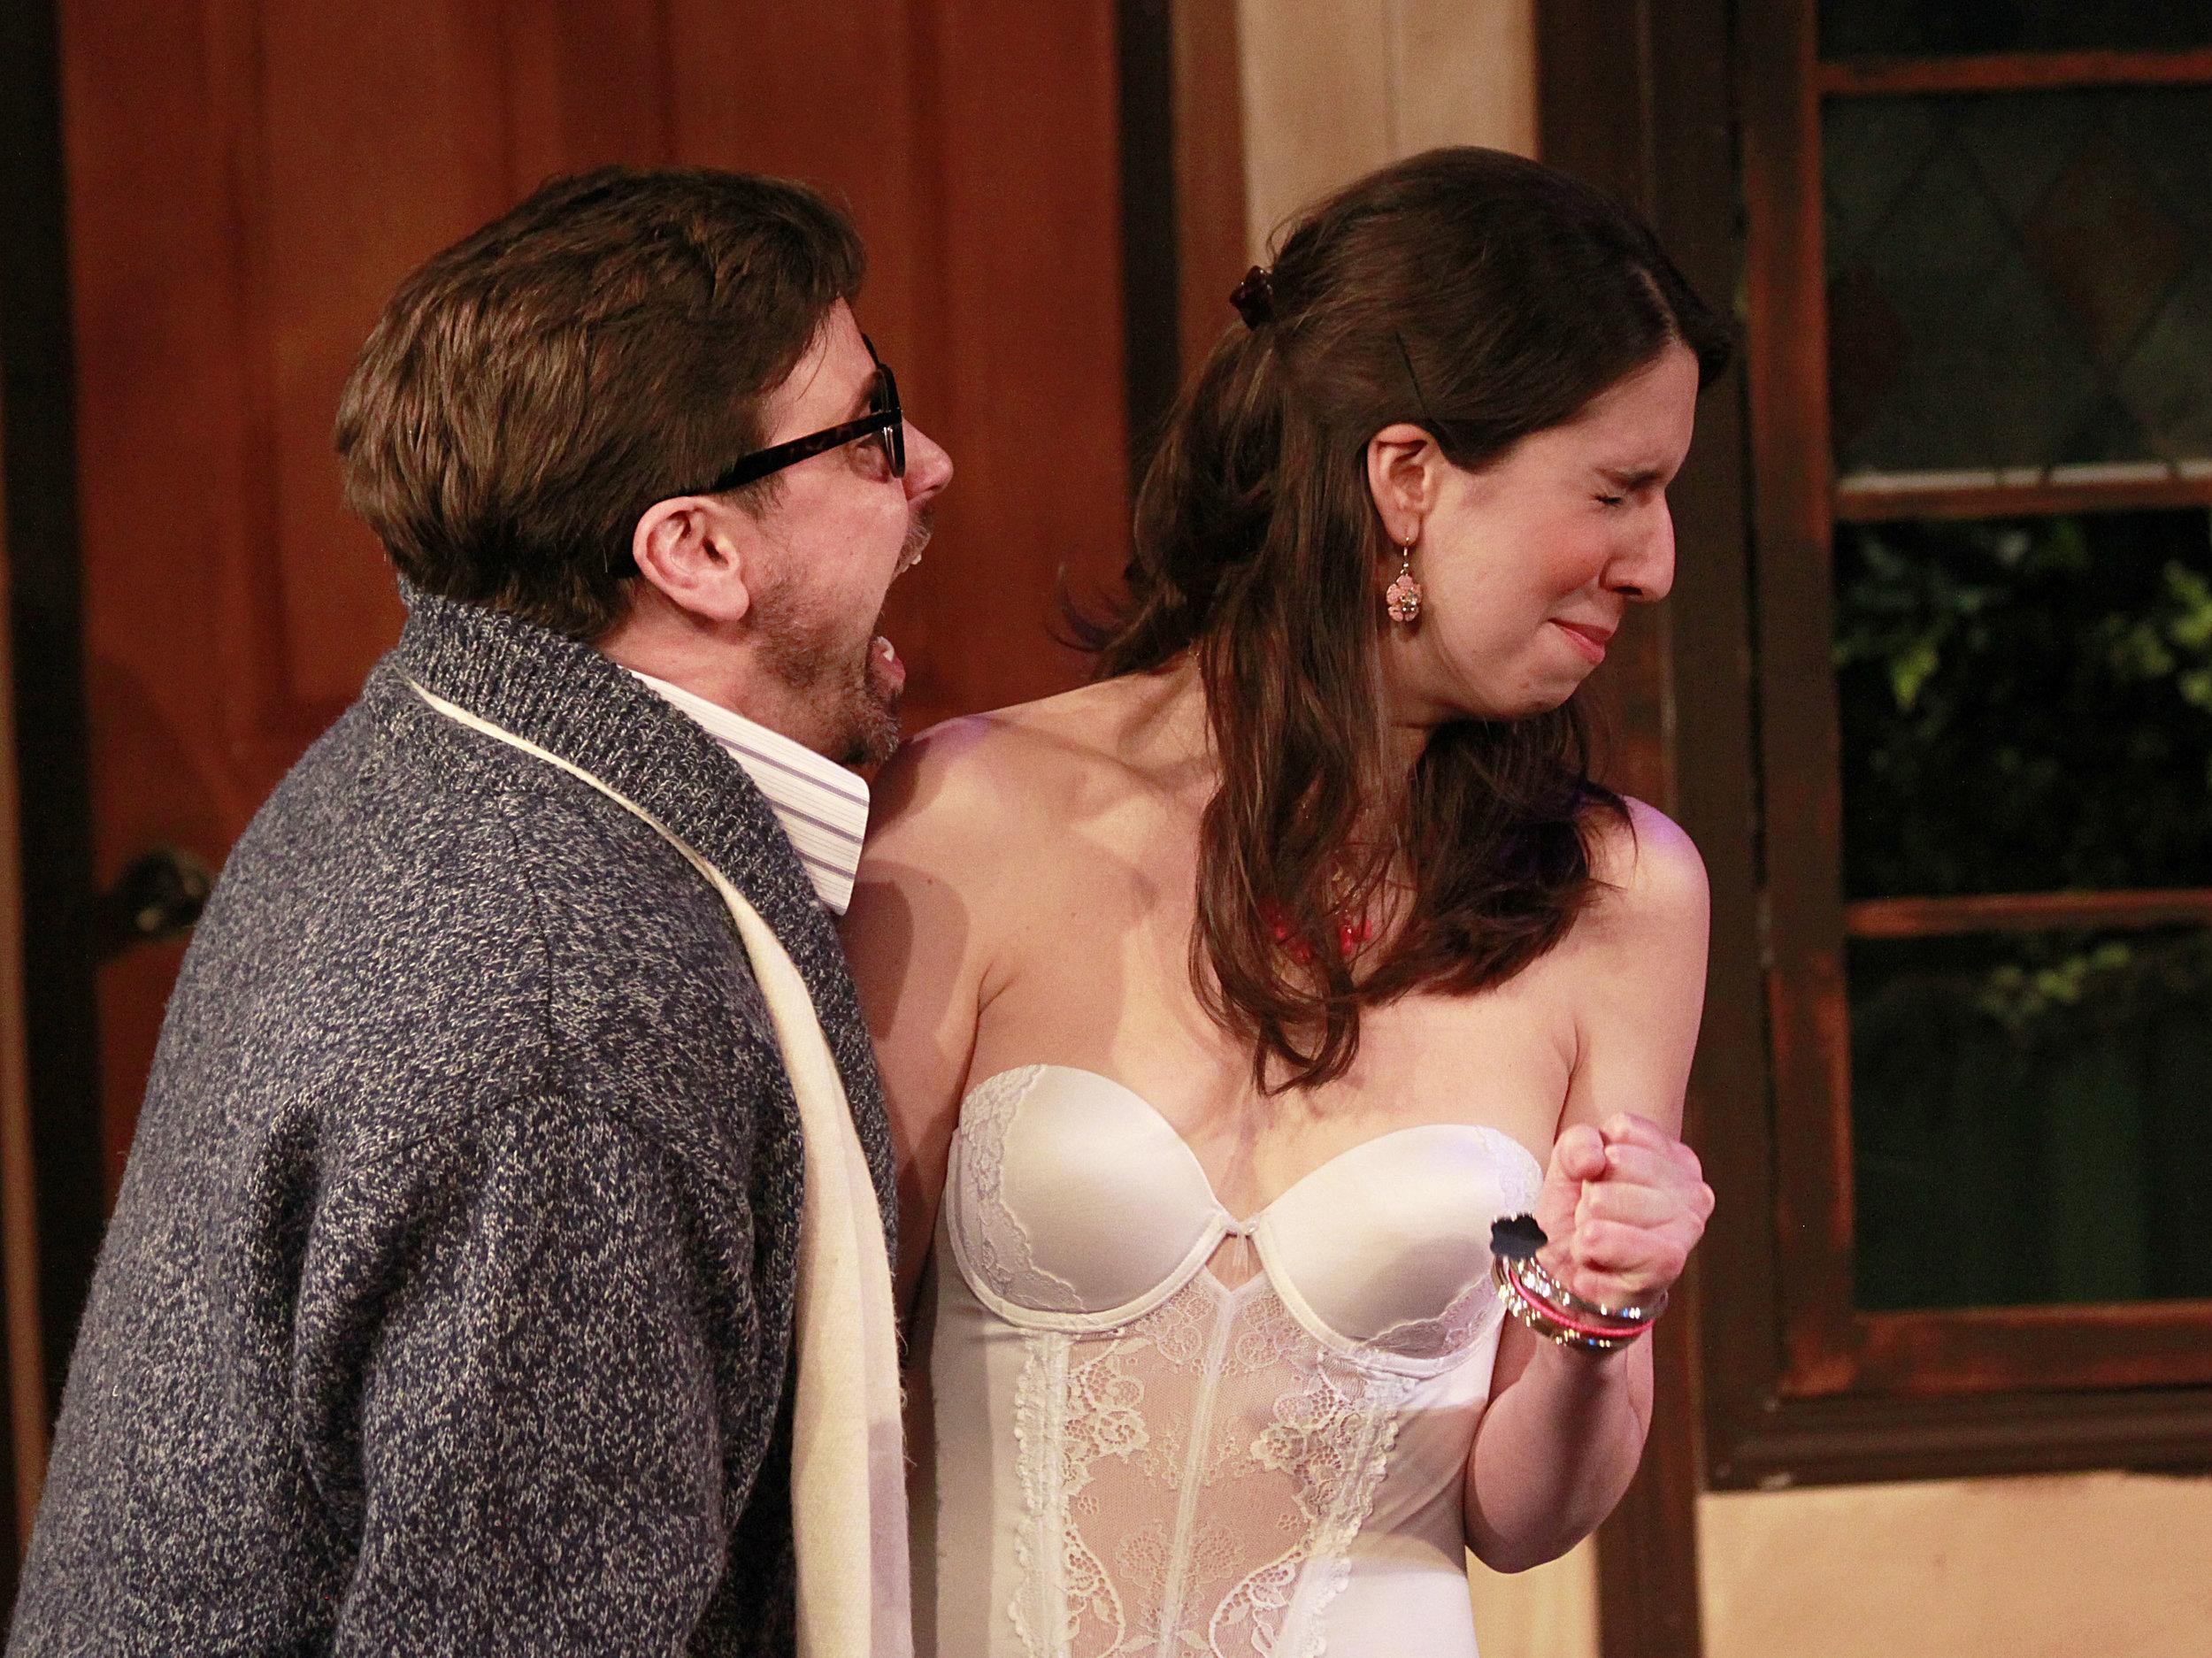 John Bixler as the ever professional director Lloyd and the lovable Brooke, played by Carmen Crafts. Photo: Jessie Dobrzynski